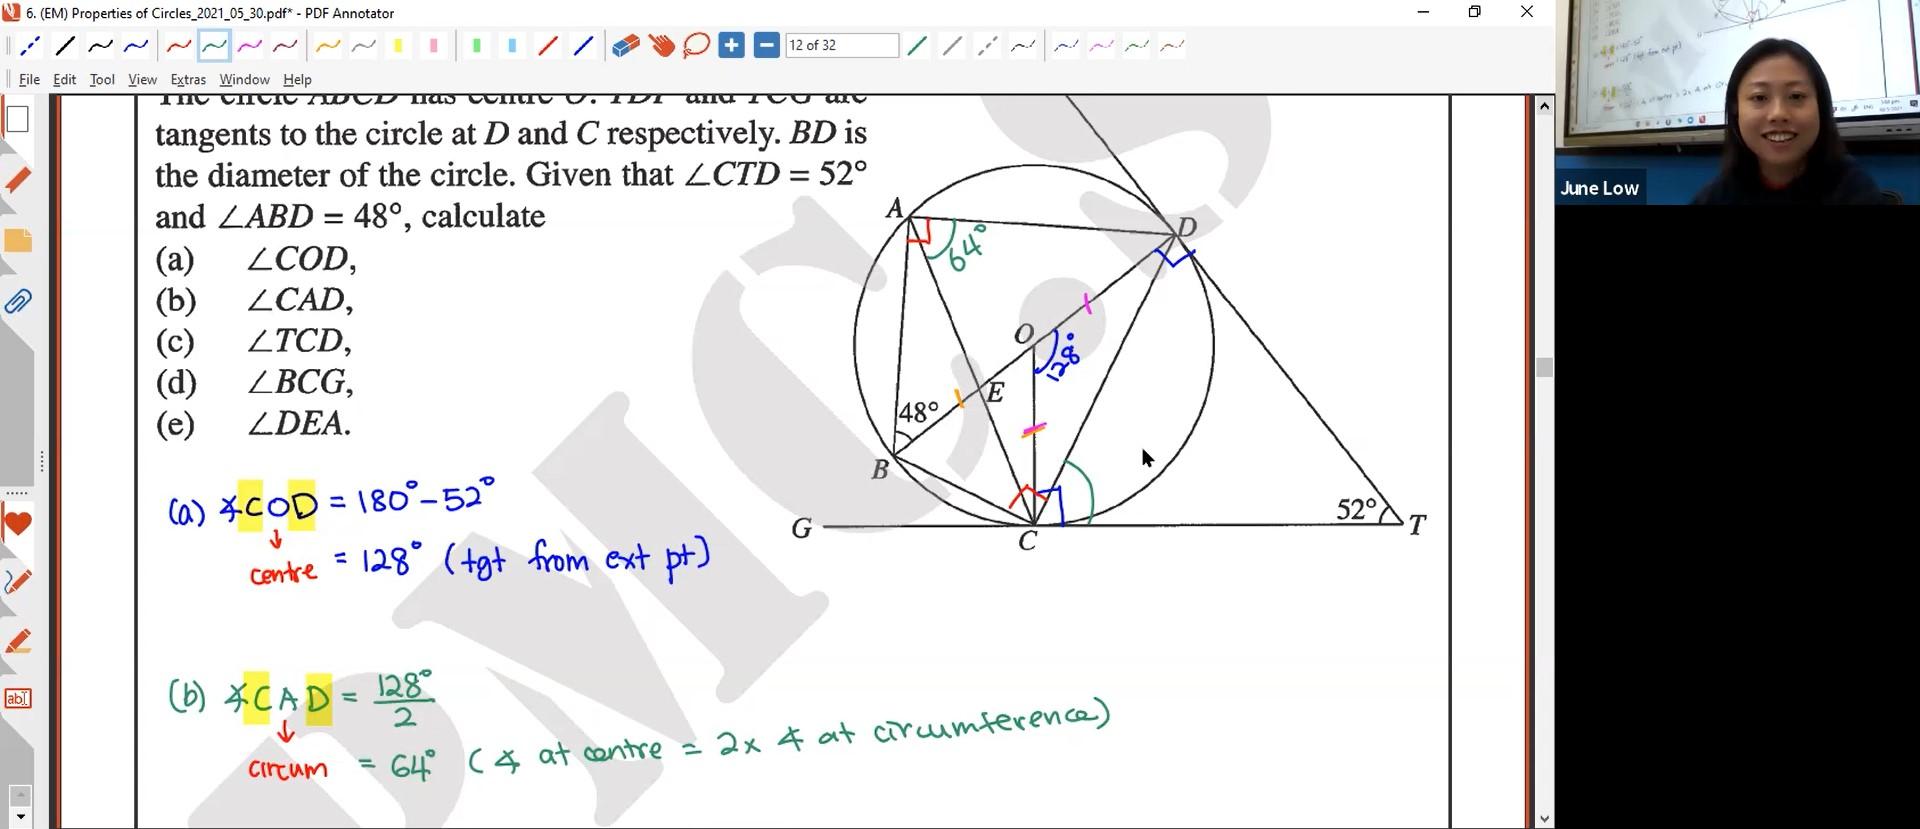 24. (EM) Properties of Circles